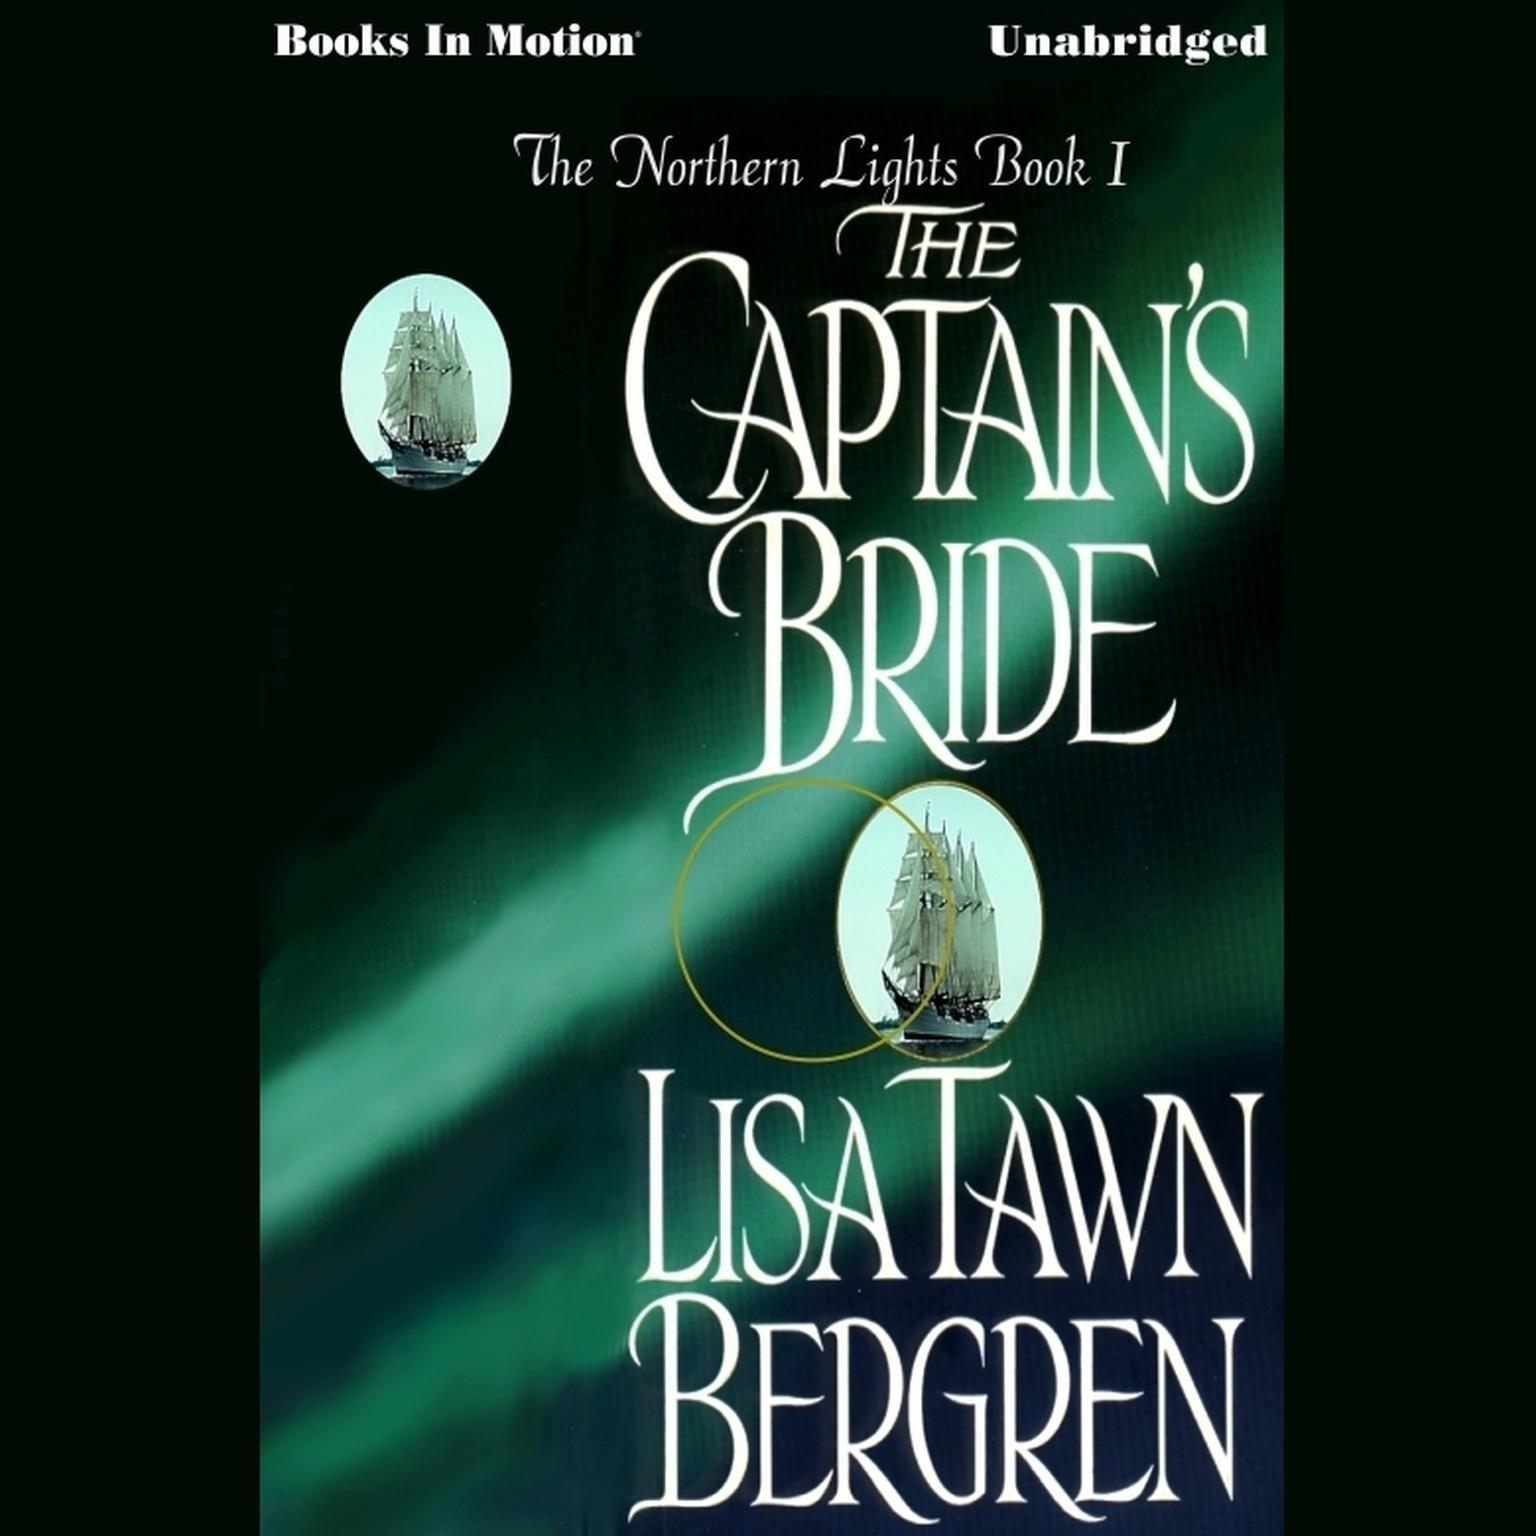 The Captains Bride Audiobook, by Lisa Tawn Bergren